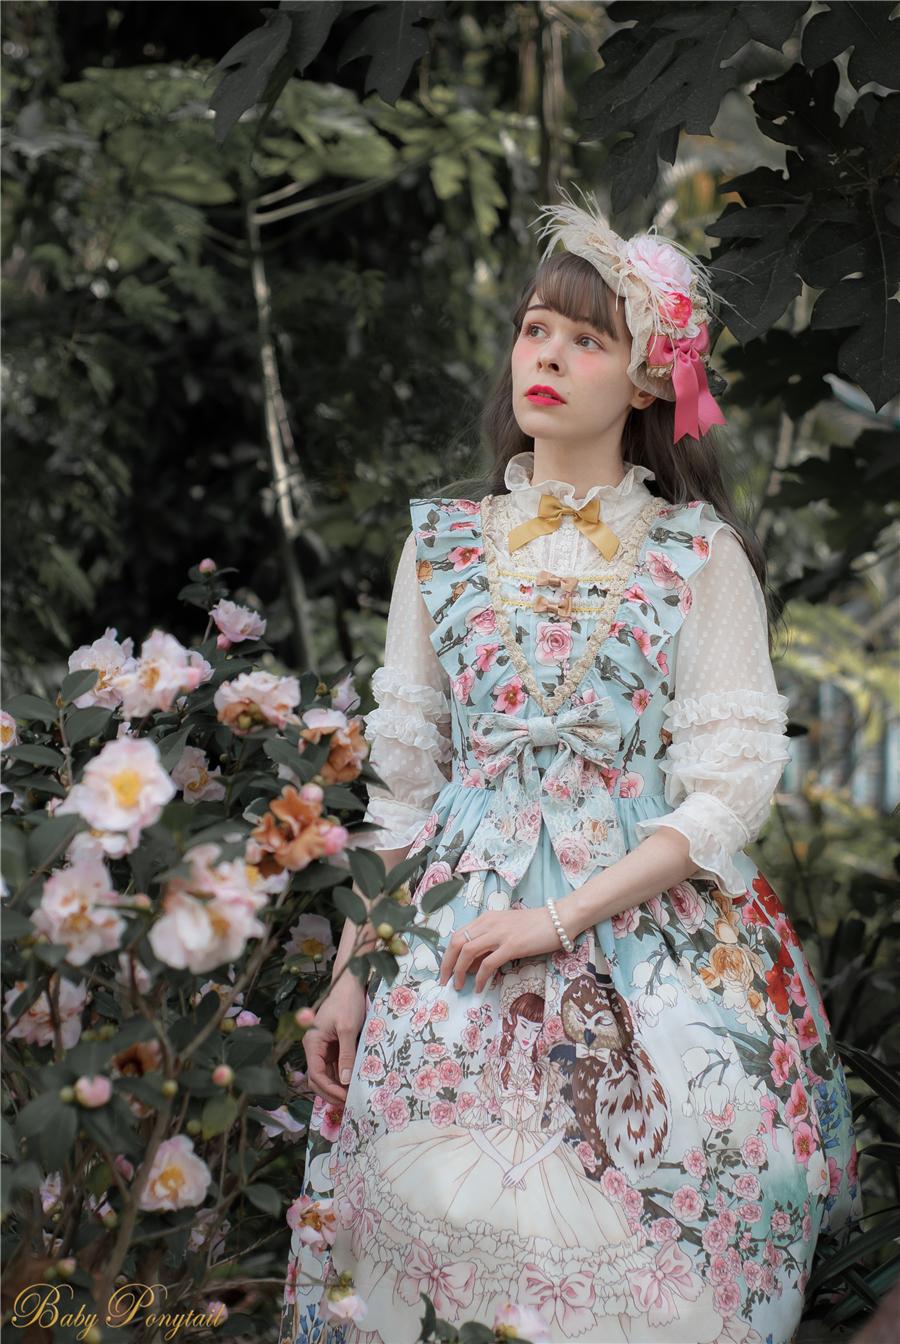 Baby Ponytail_Model Photo_Polly's Garden of Dreams_JSK Sky_Claudia18.jpg